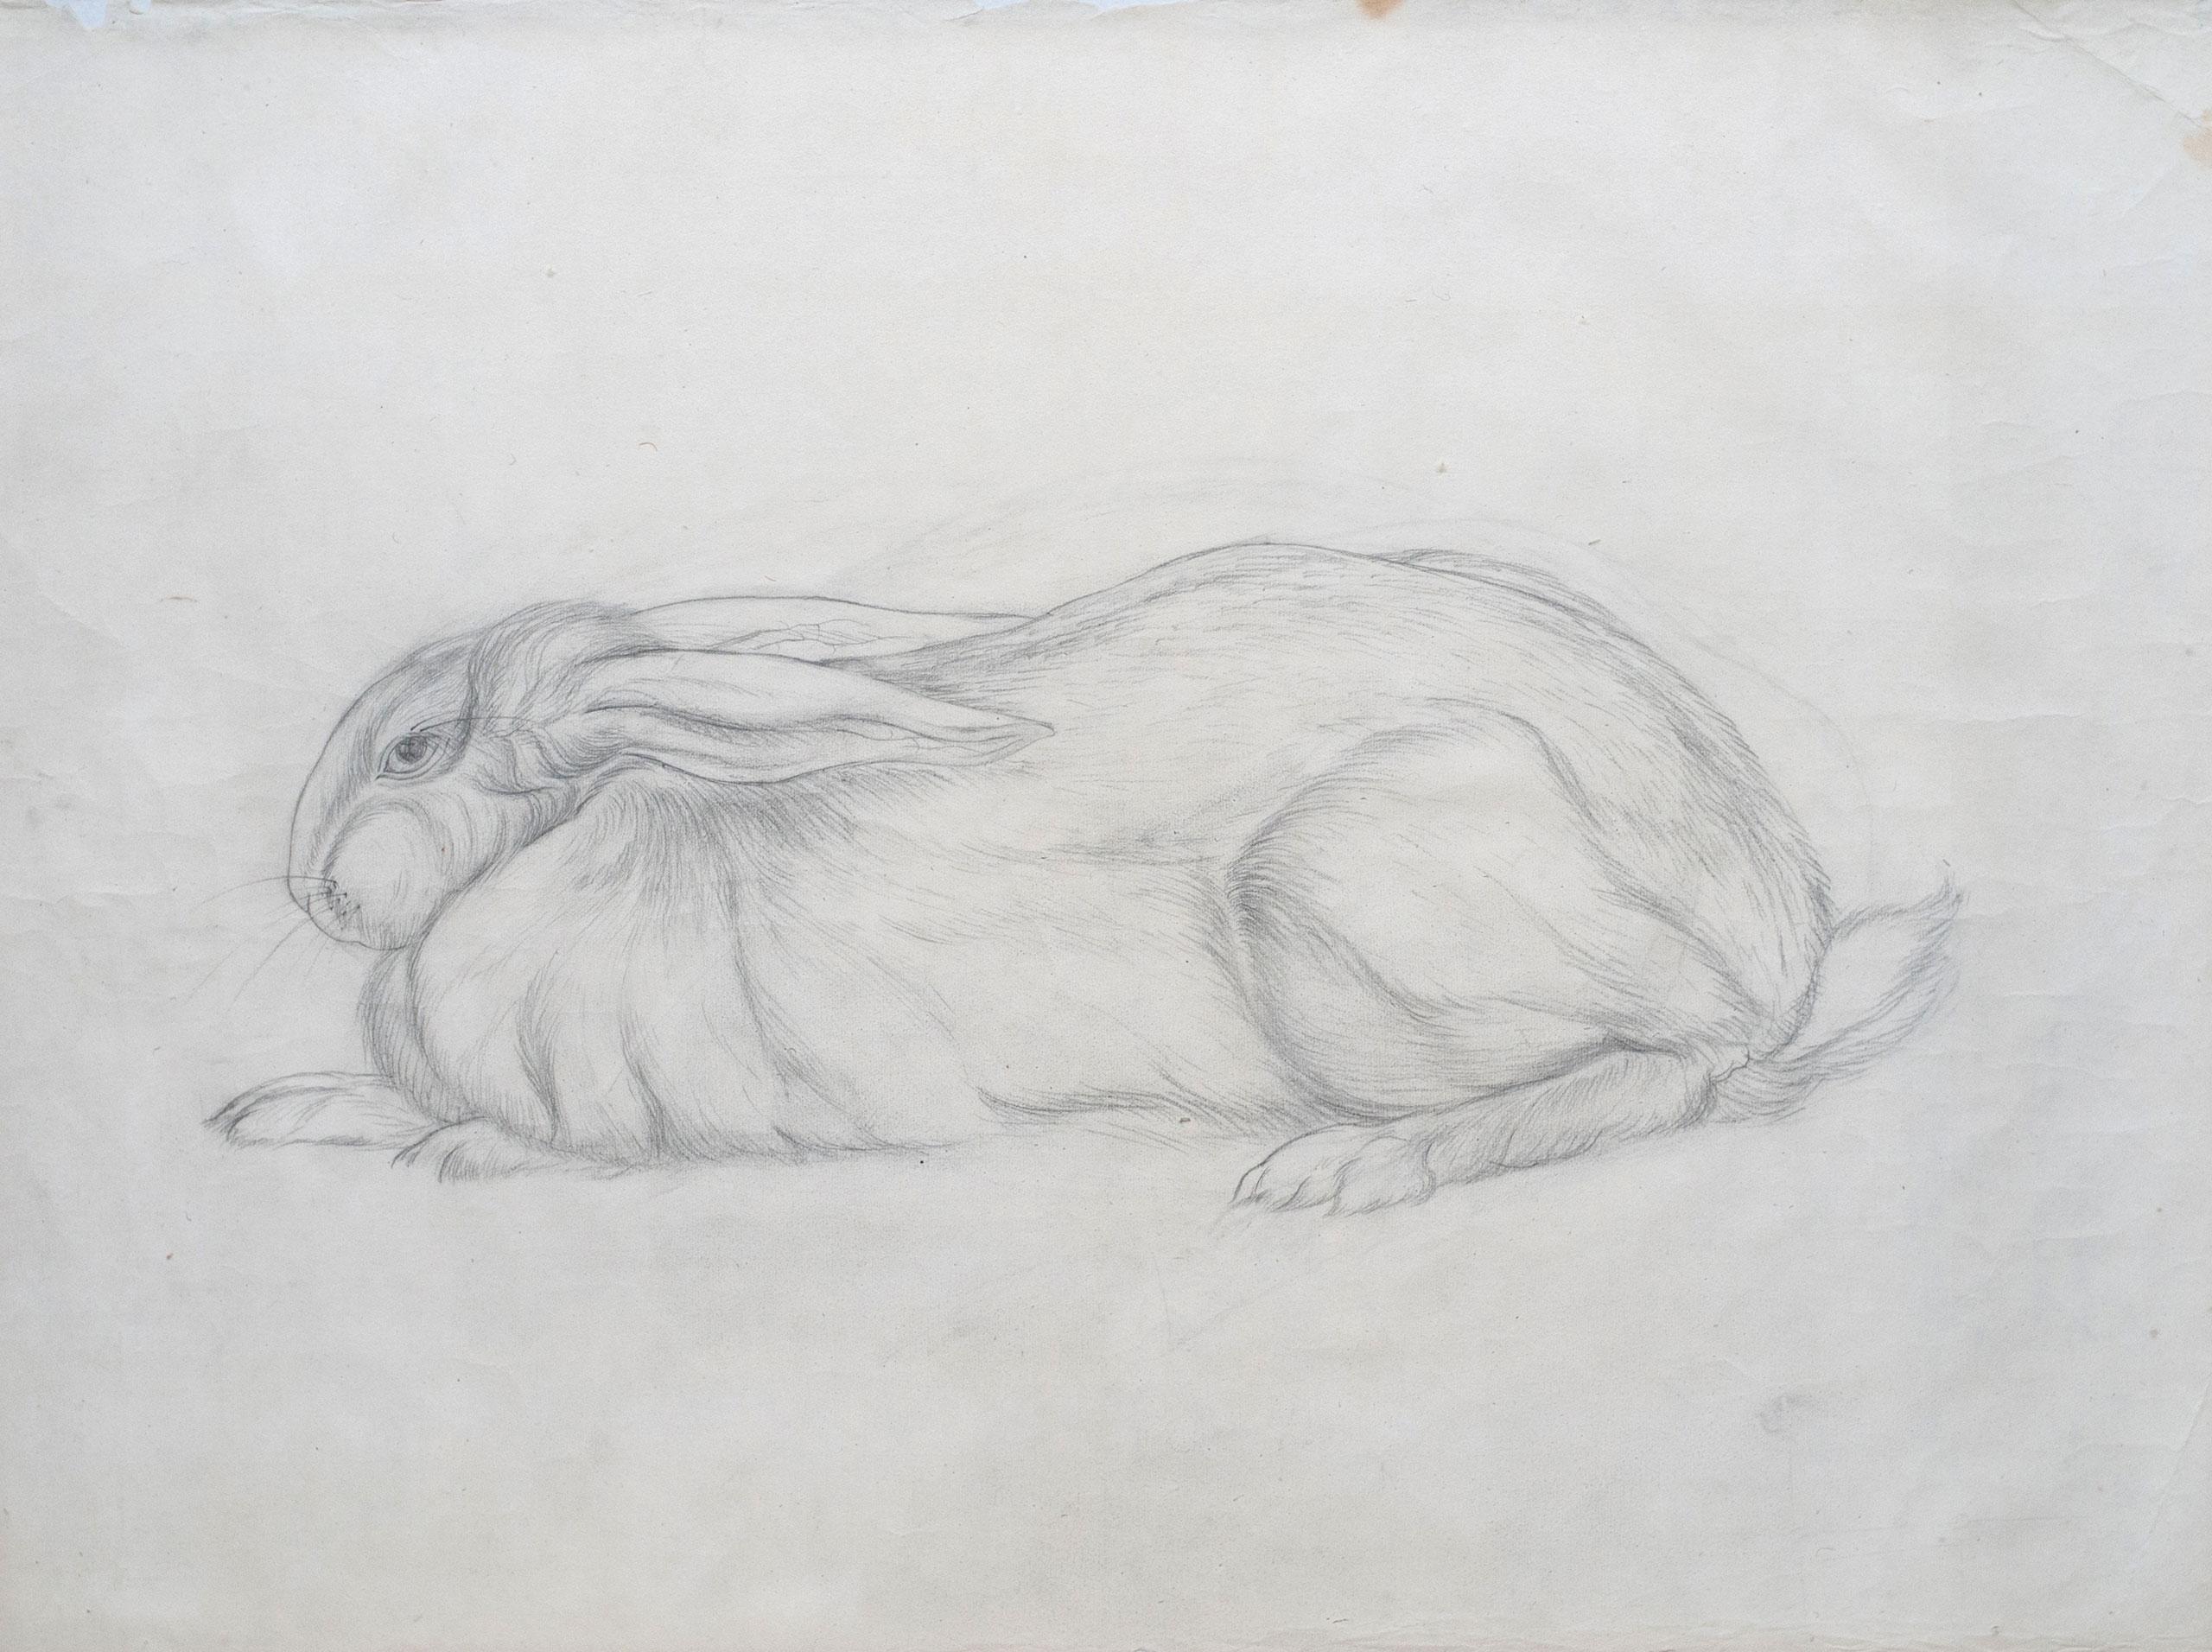 兎* - Rabbit